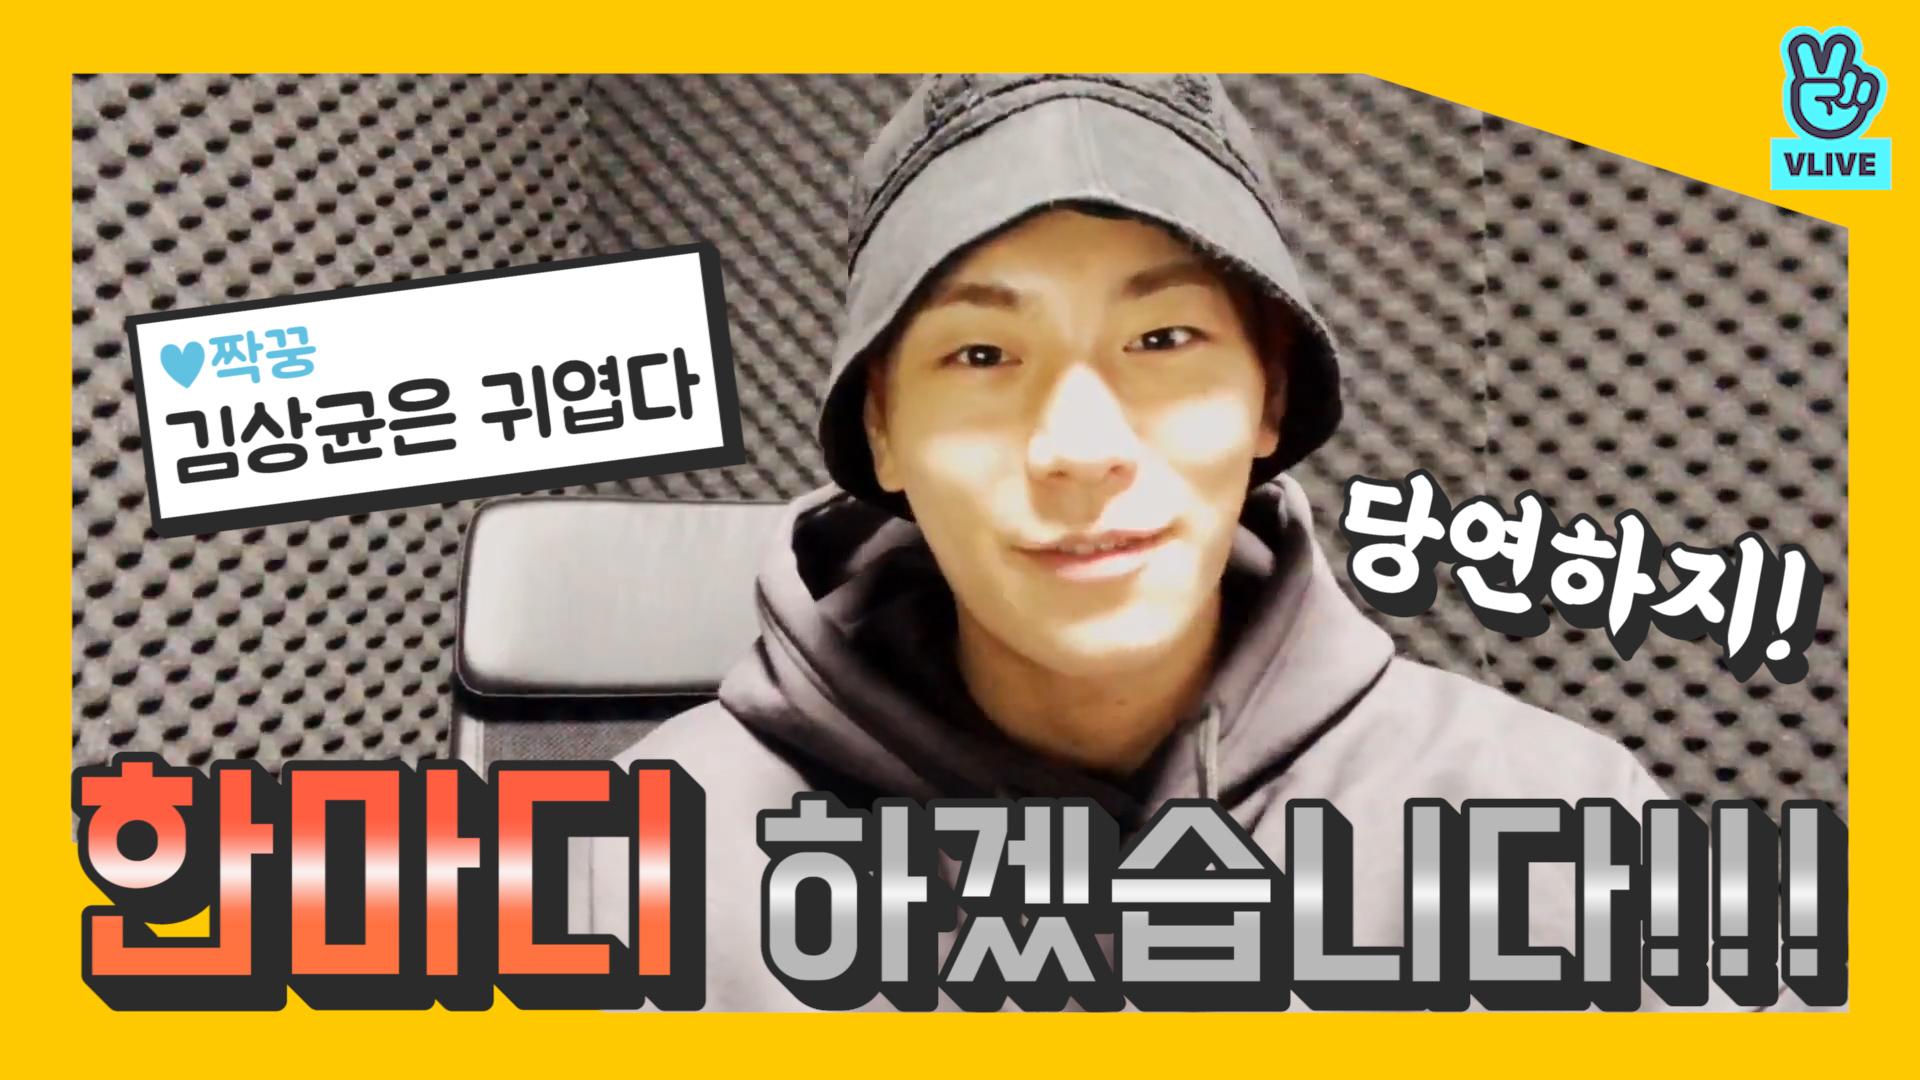 [JBJ95] 한마디 하겠습니다! 우리 댕댕이가 너무 귀엽습니다! (SANGKYUN talking about his recent days)